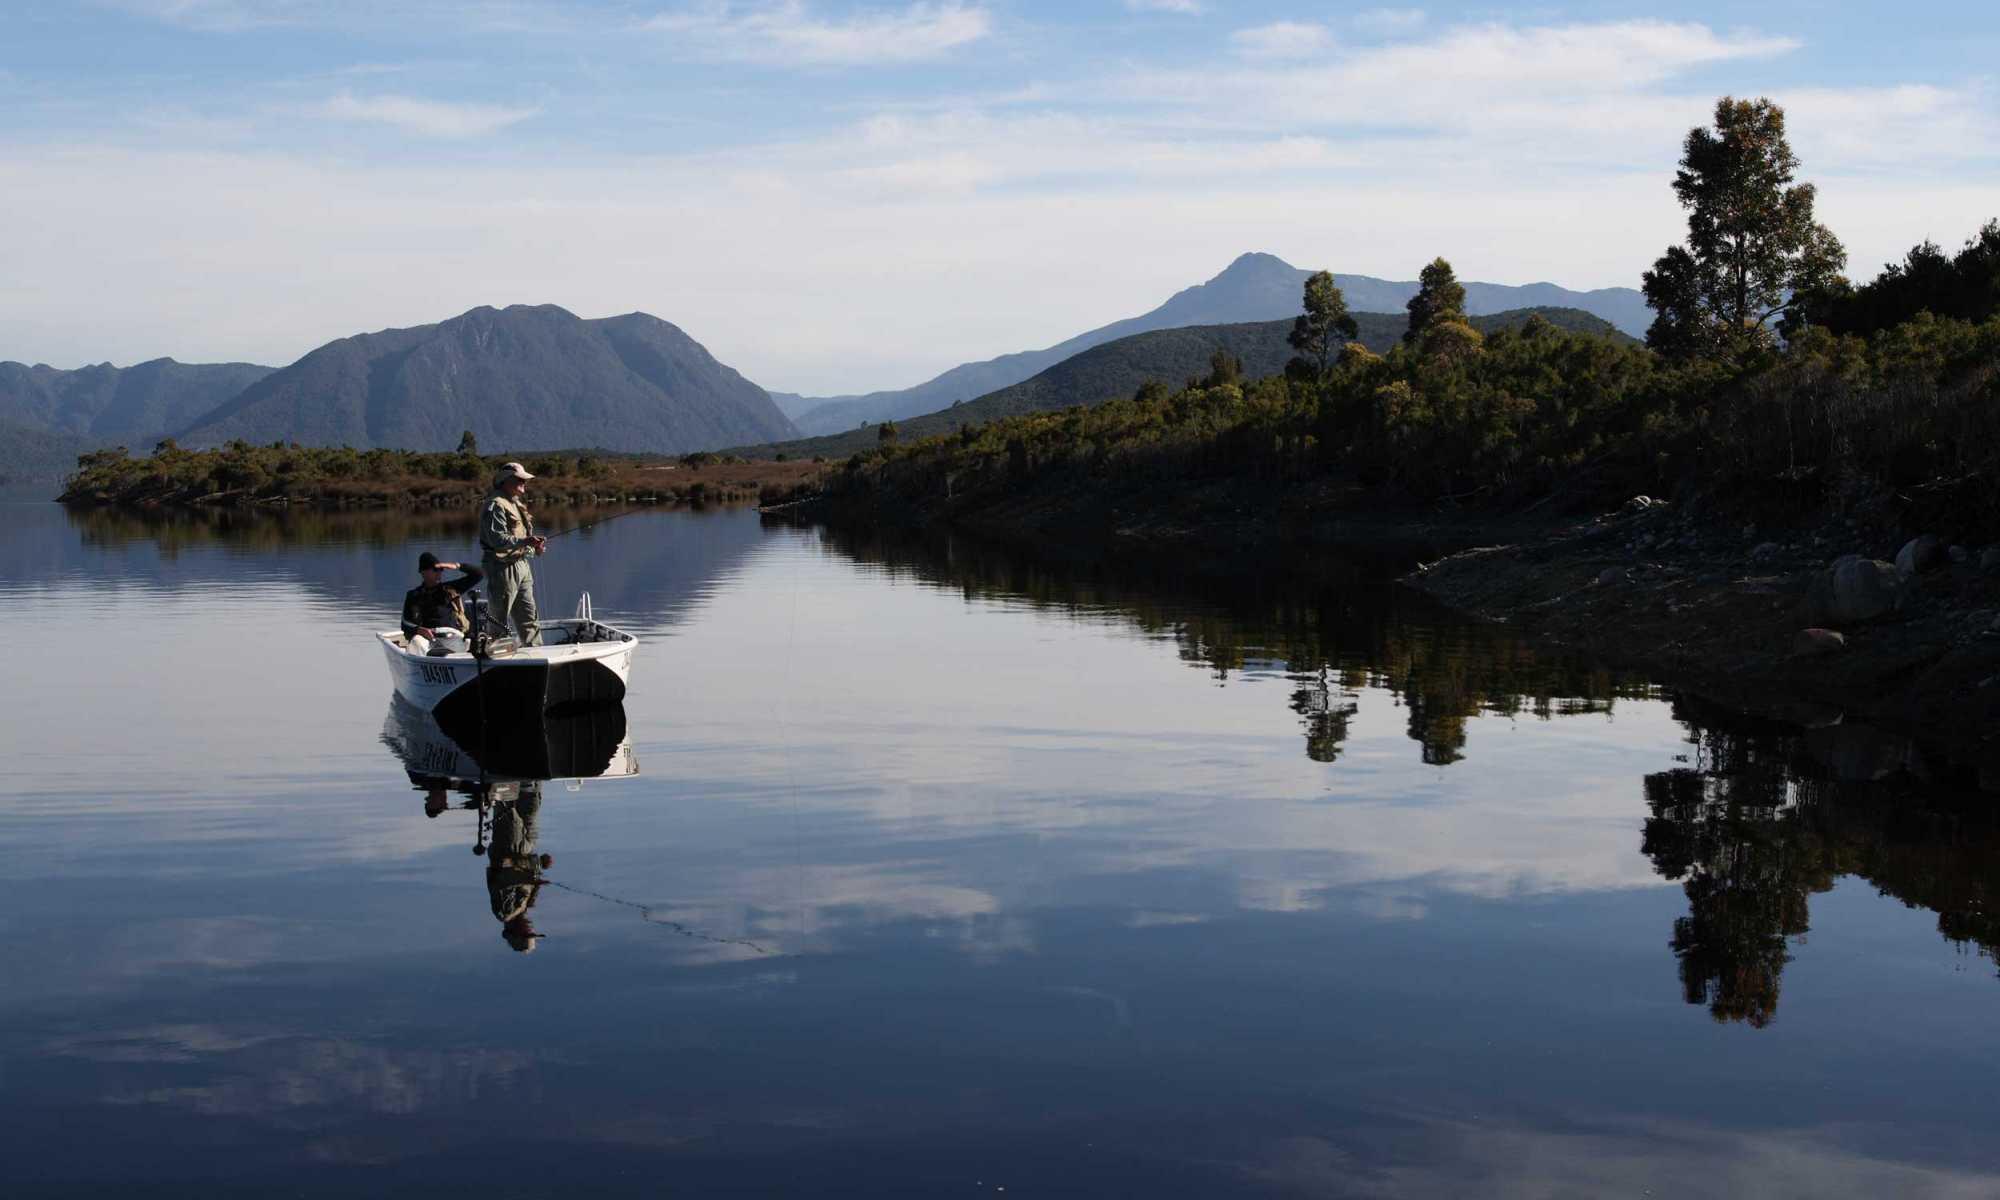 Fly fishing trips rainbow lodge tasmania for Fly fishing trips